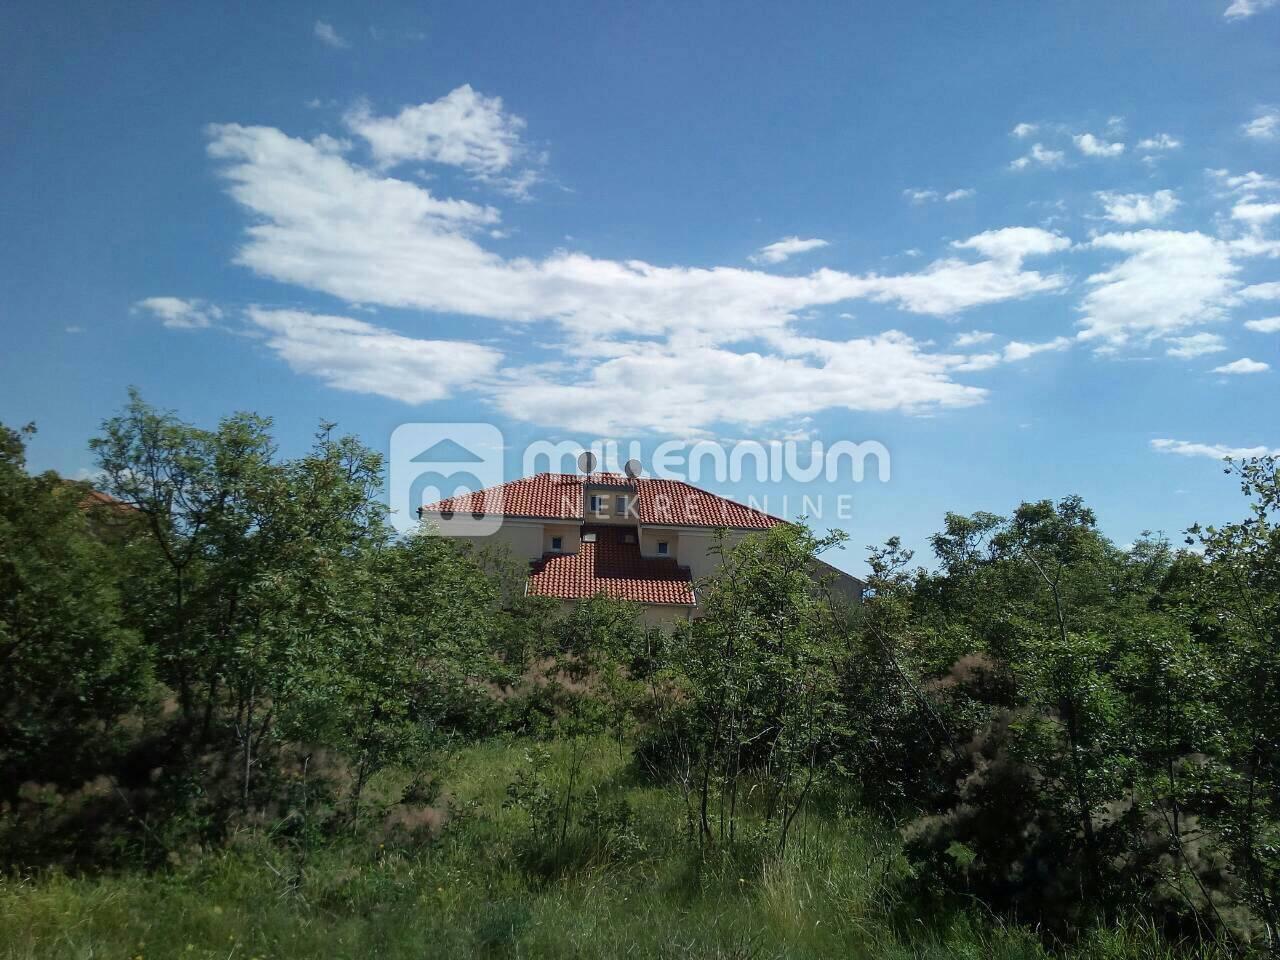 Viškovo, građevinsko zemljište od 1.005m2